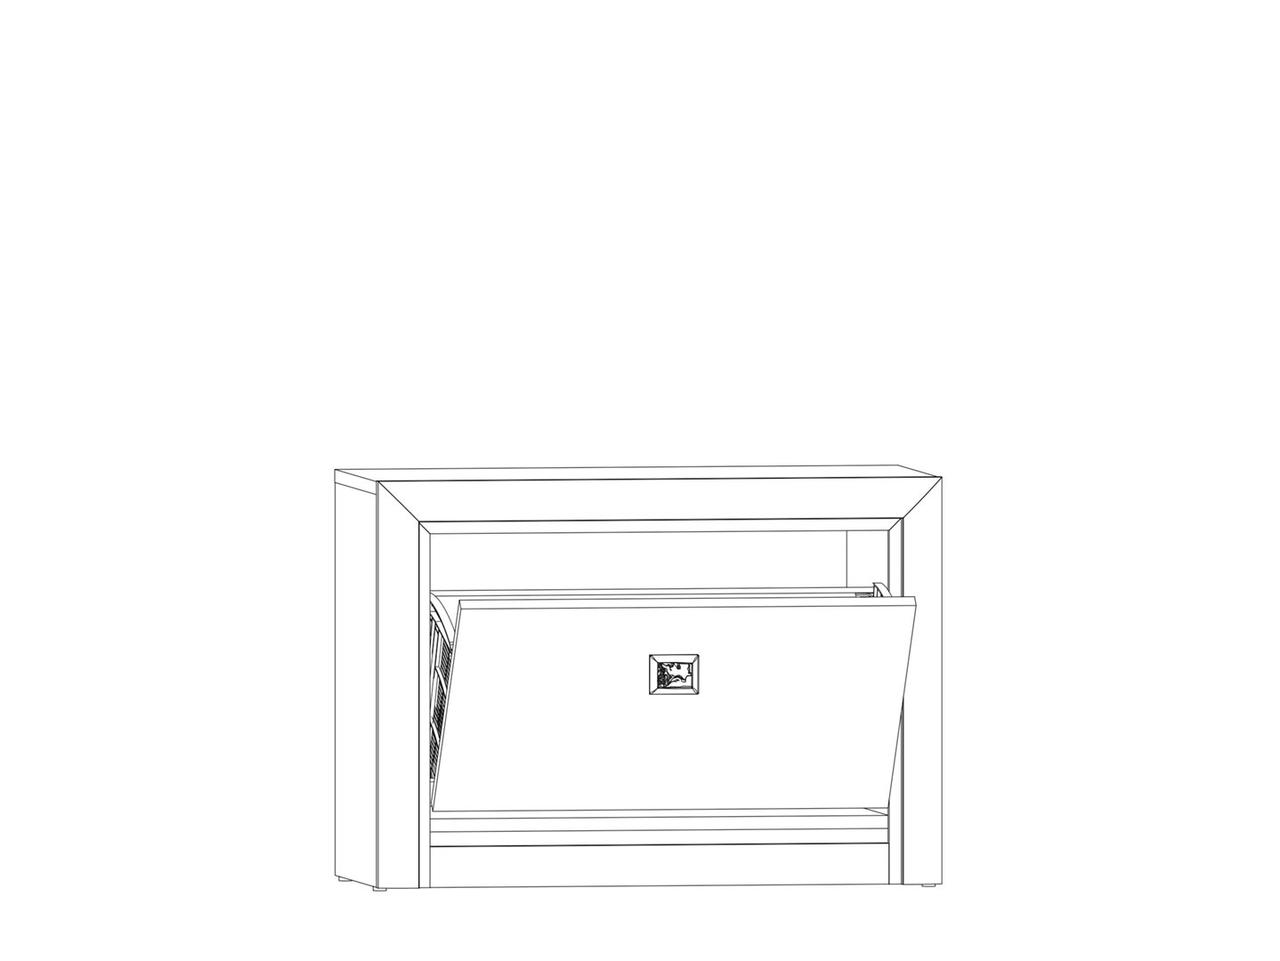 Тумба для обуви 1Д, коллекции Коен МДФ, Штрокс Темный, БРВ Брест (Беларусь)